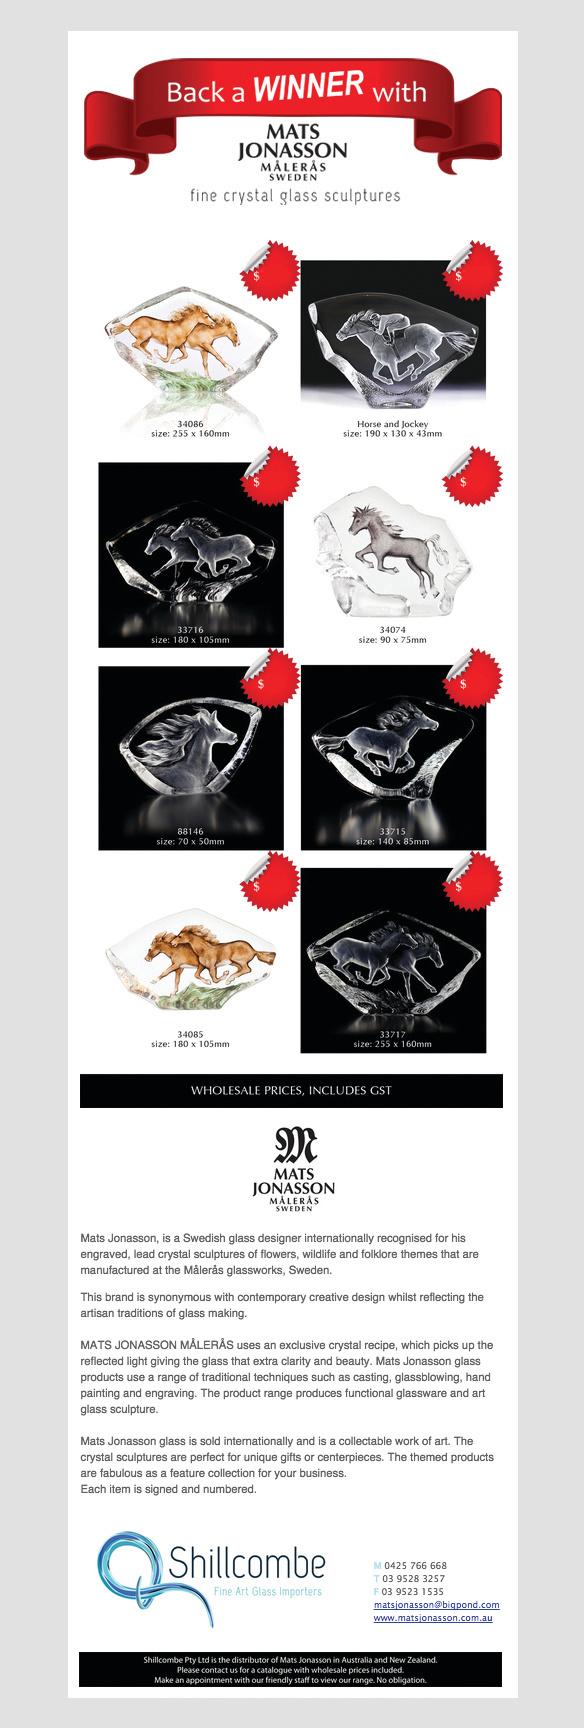 Shillcombe Fine Art Glass Importers